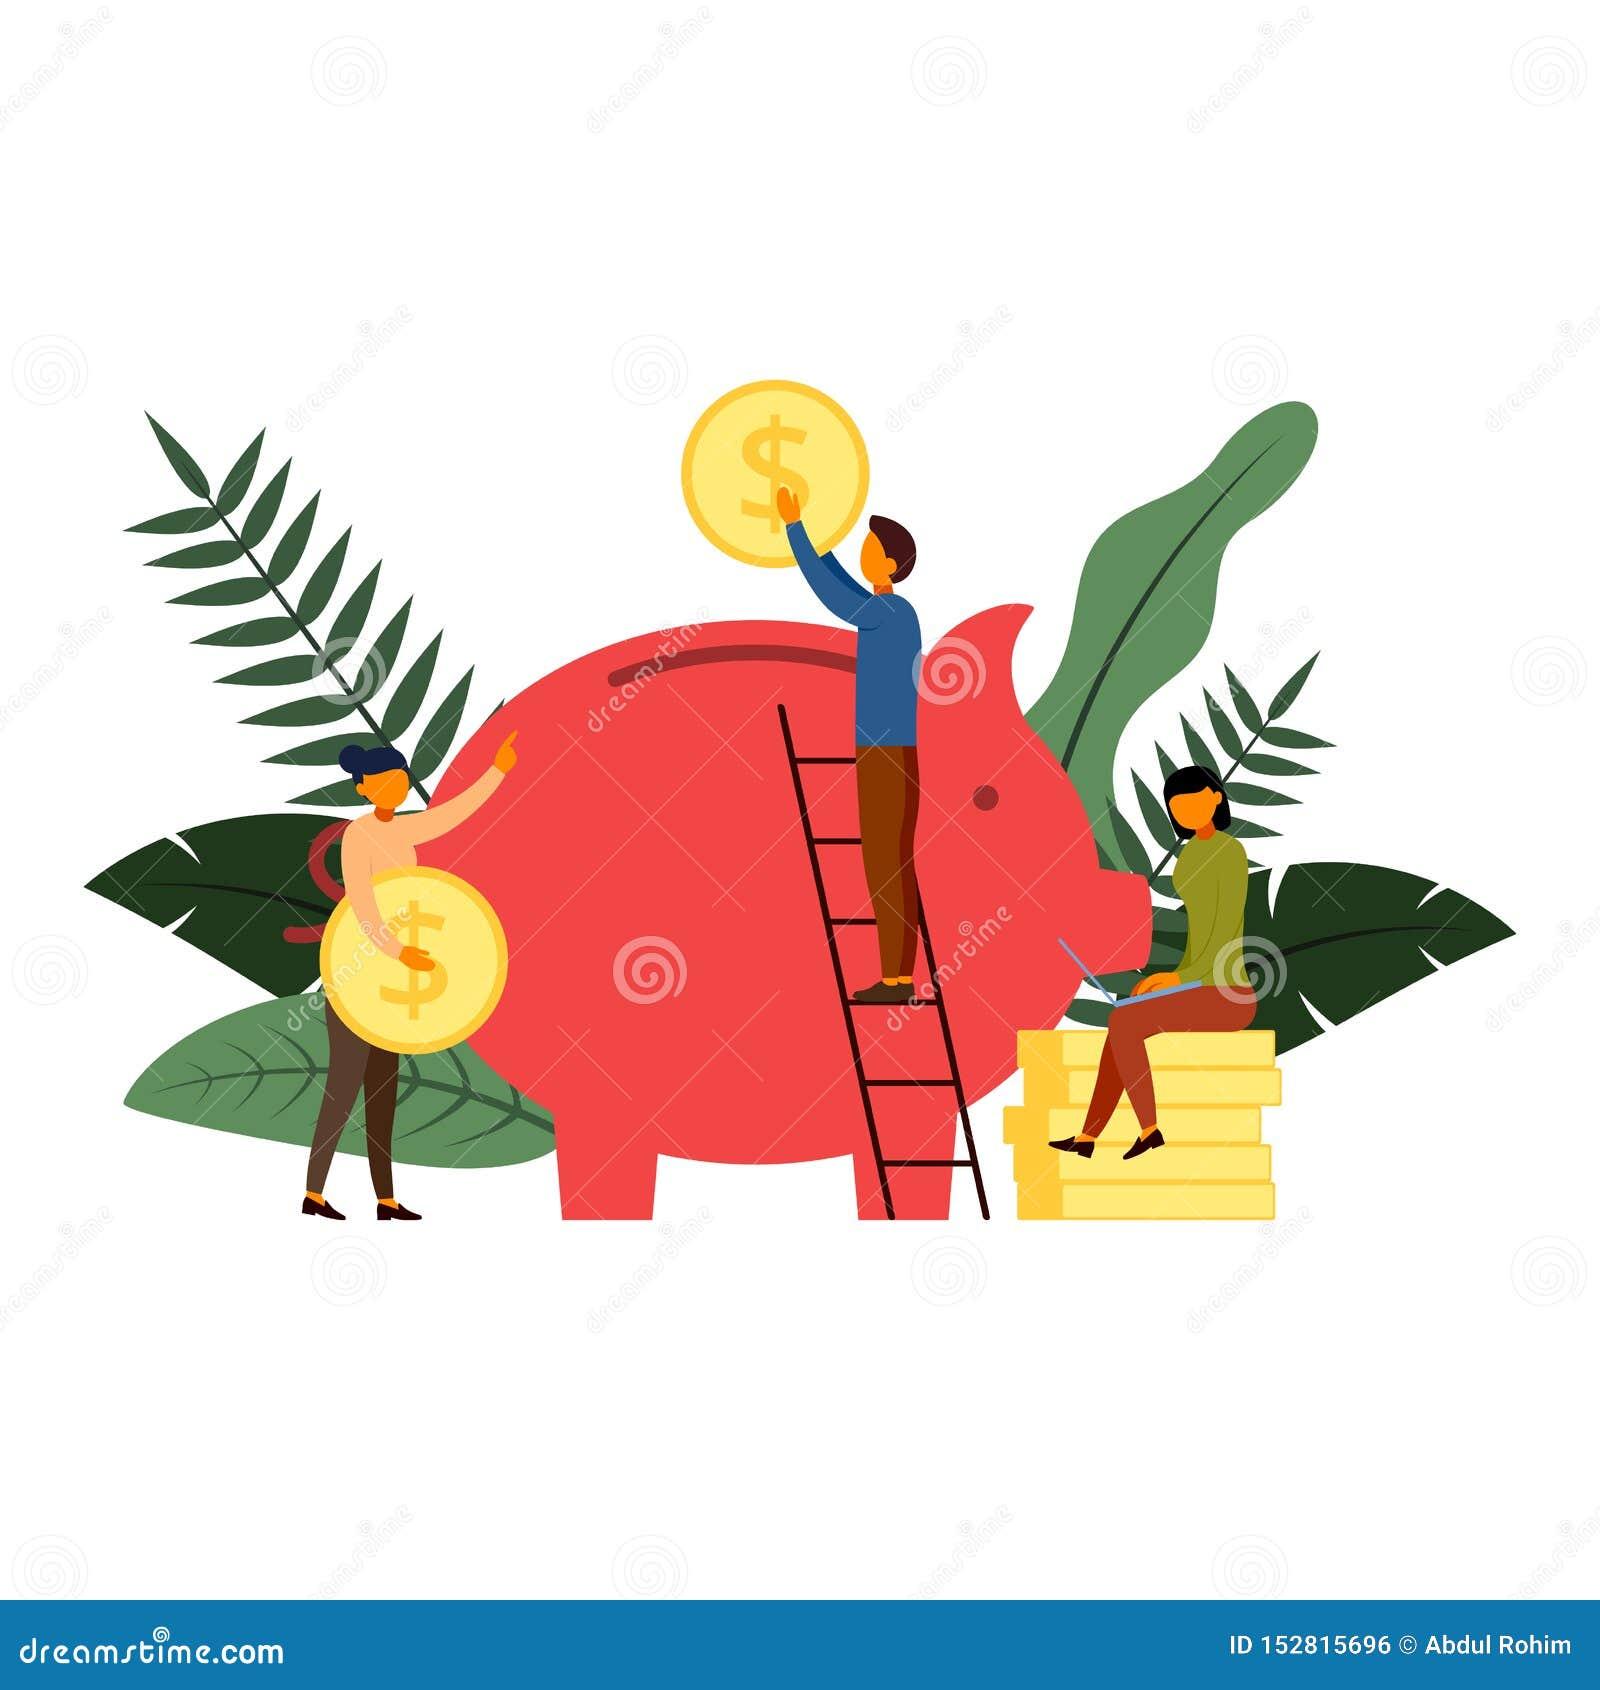 Bank Financing, Open A Bank Deposit, Financial Services